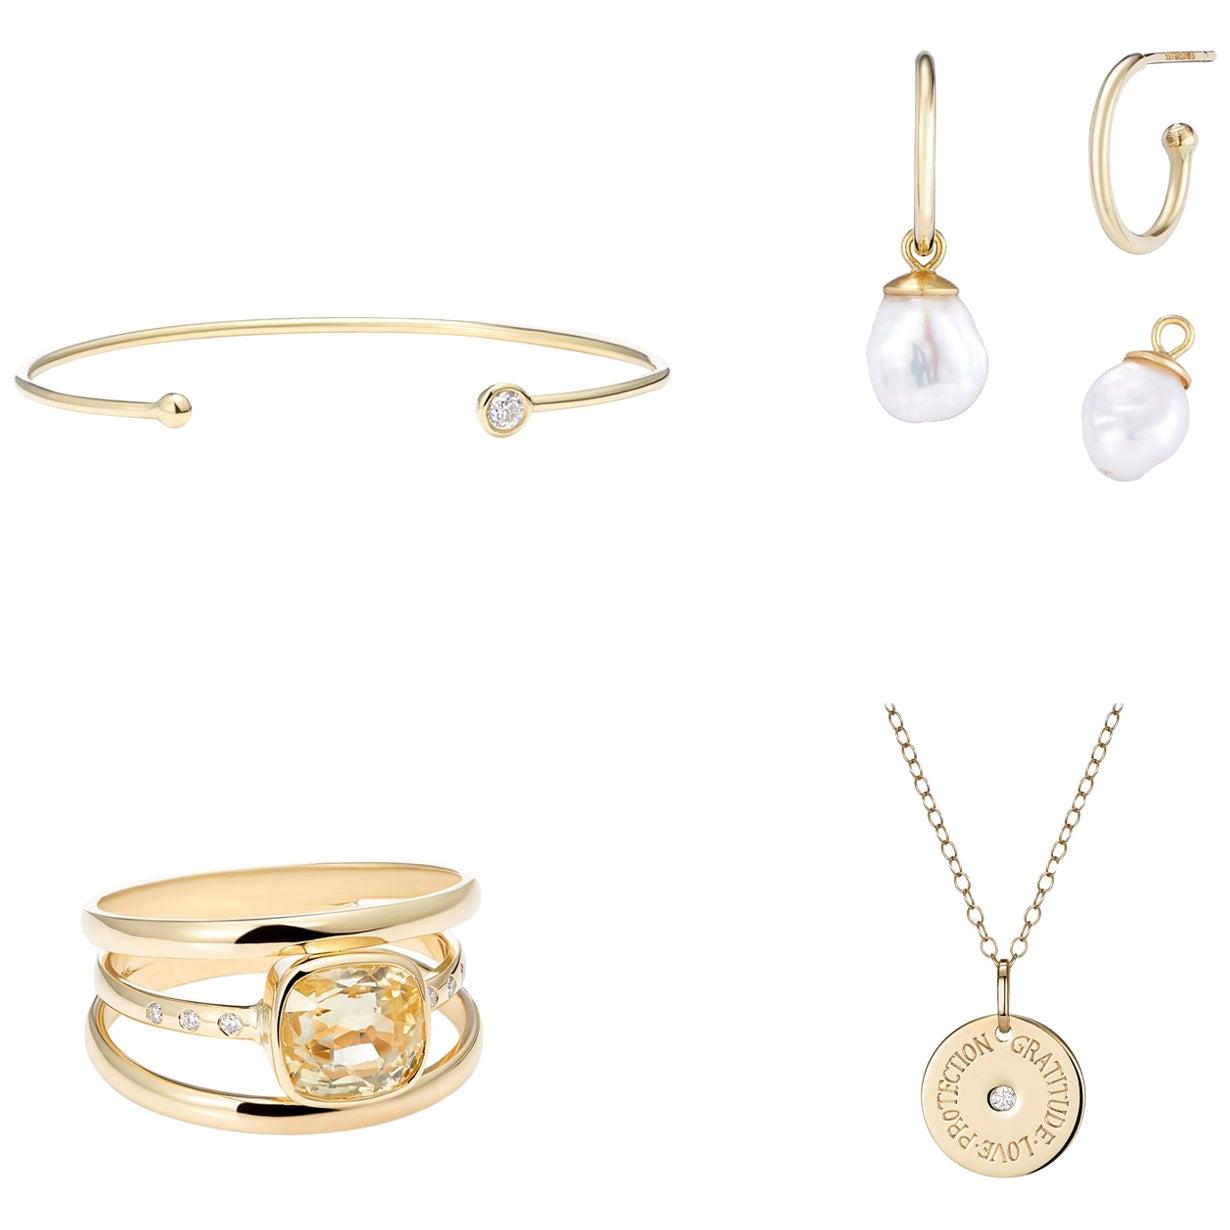 4 Piece Suite Gold White Diamonds, No Heat Sri Lankan Yellow Sapphire and Pearls